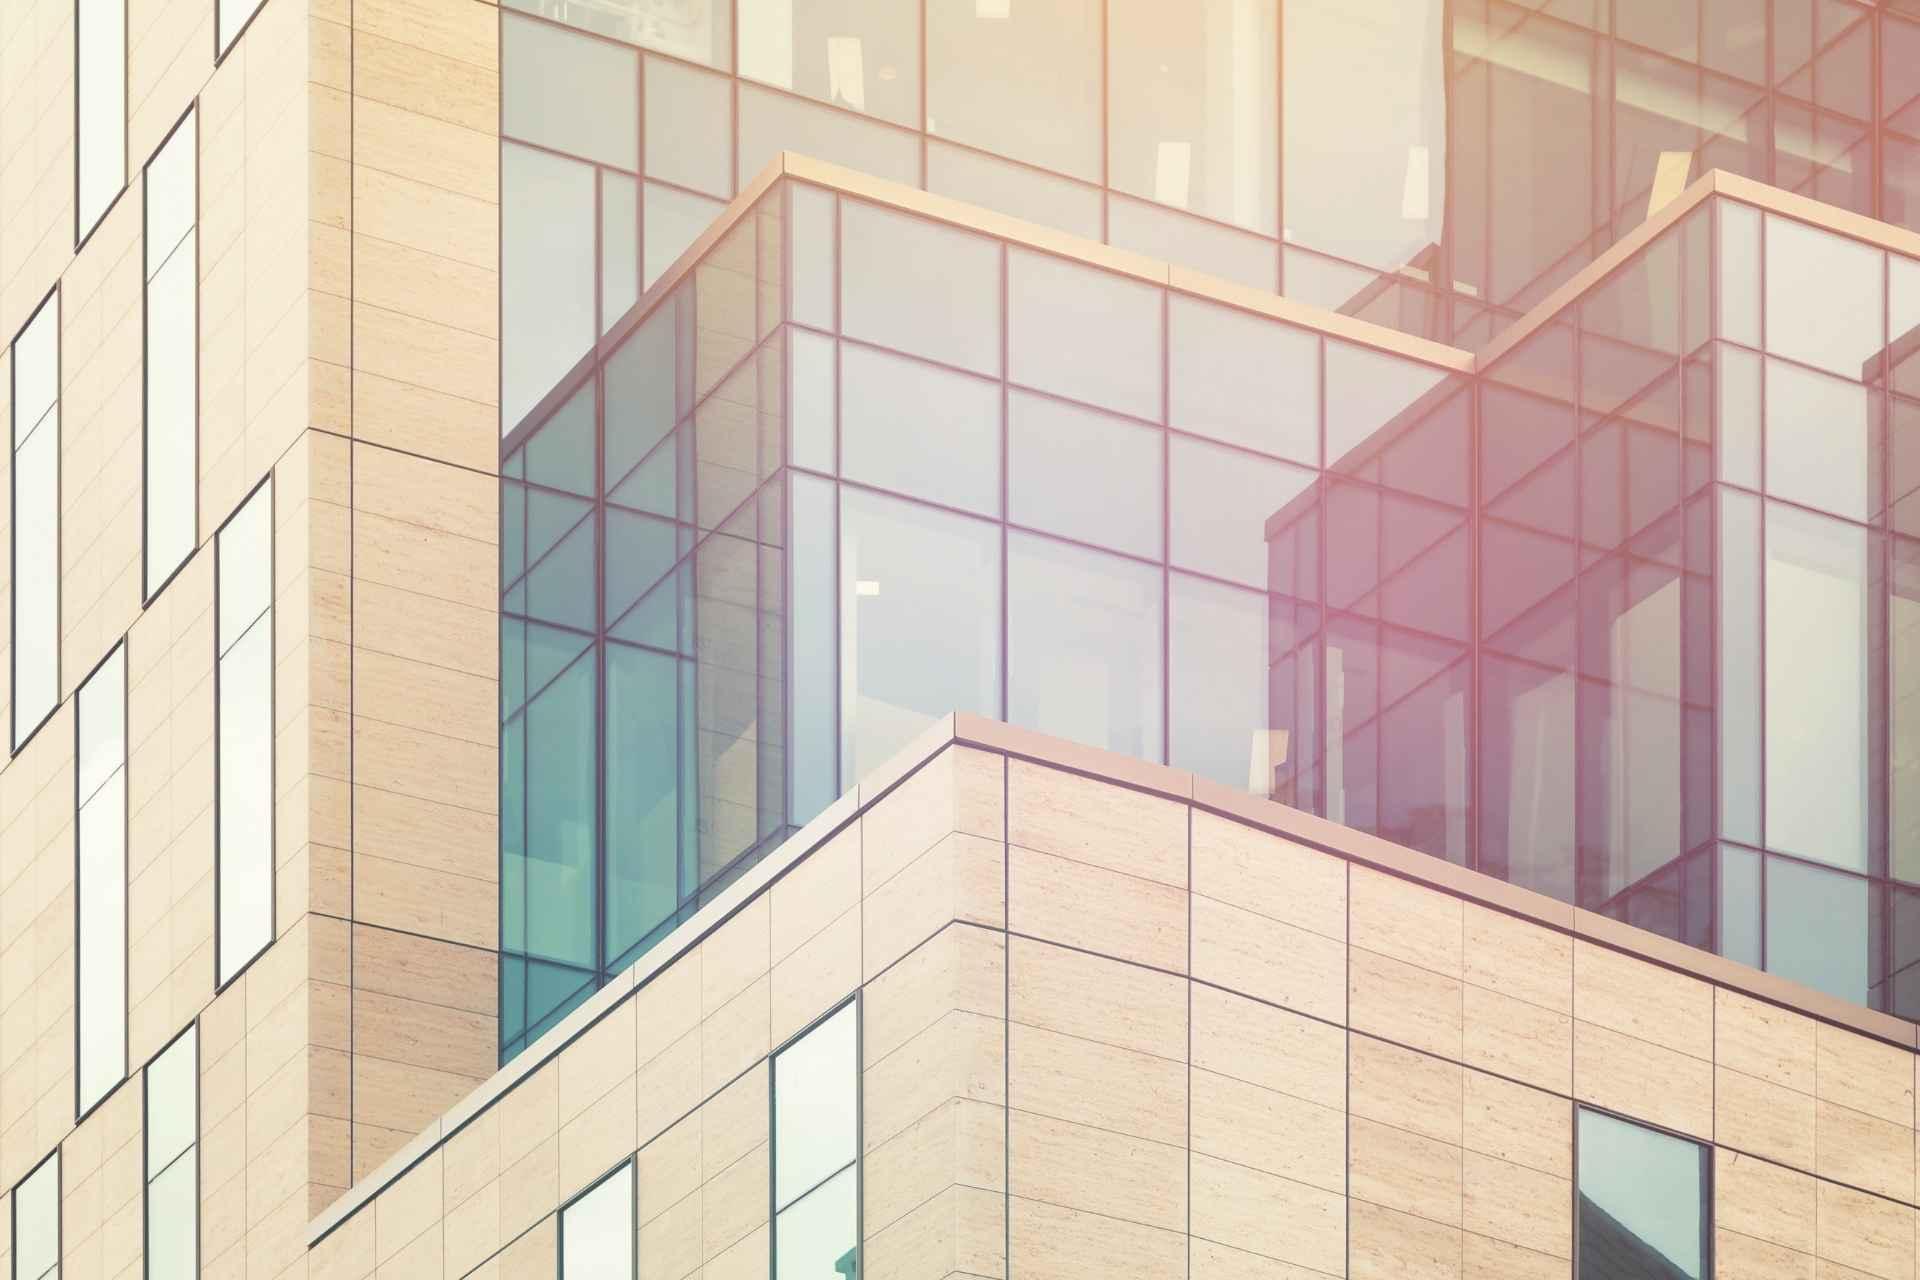 Glass Windows on Building